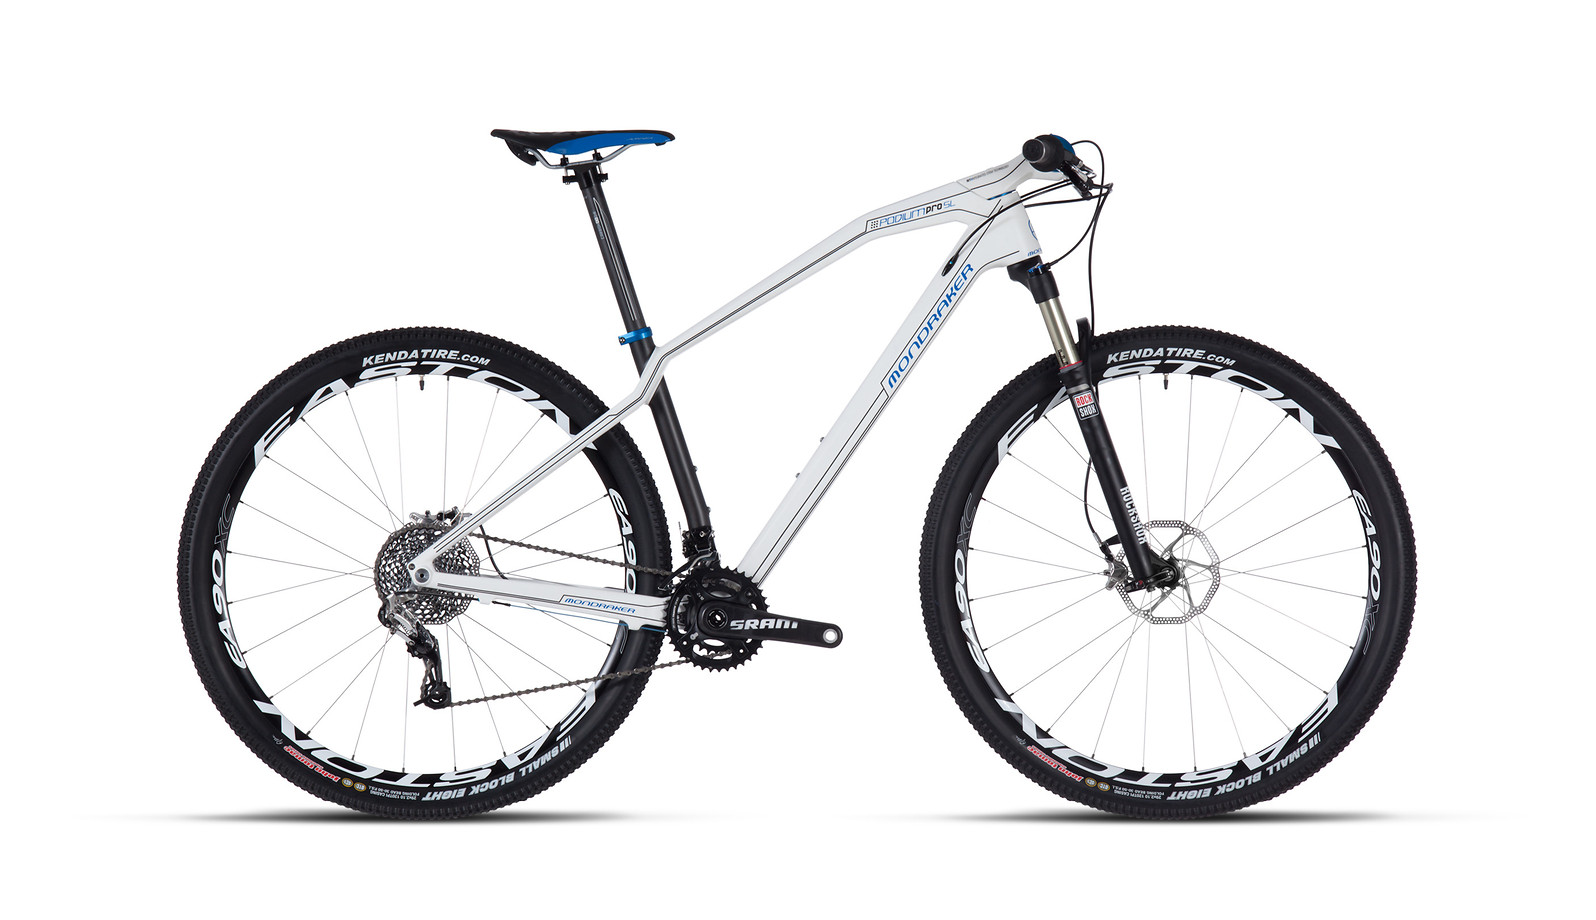 2013 Mondraker Podium Carbon Pro SL 29er Bike bike - mondraker podium carbon pro sl 29er